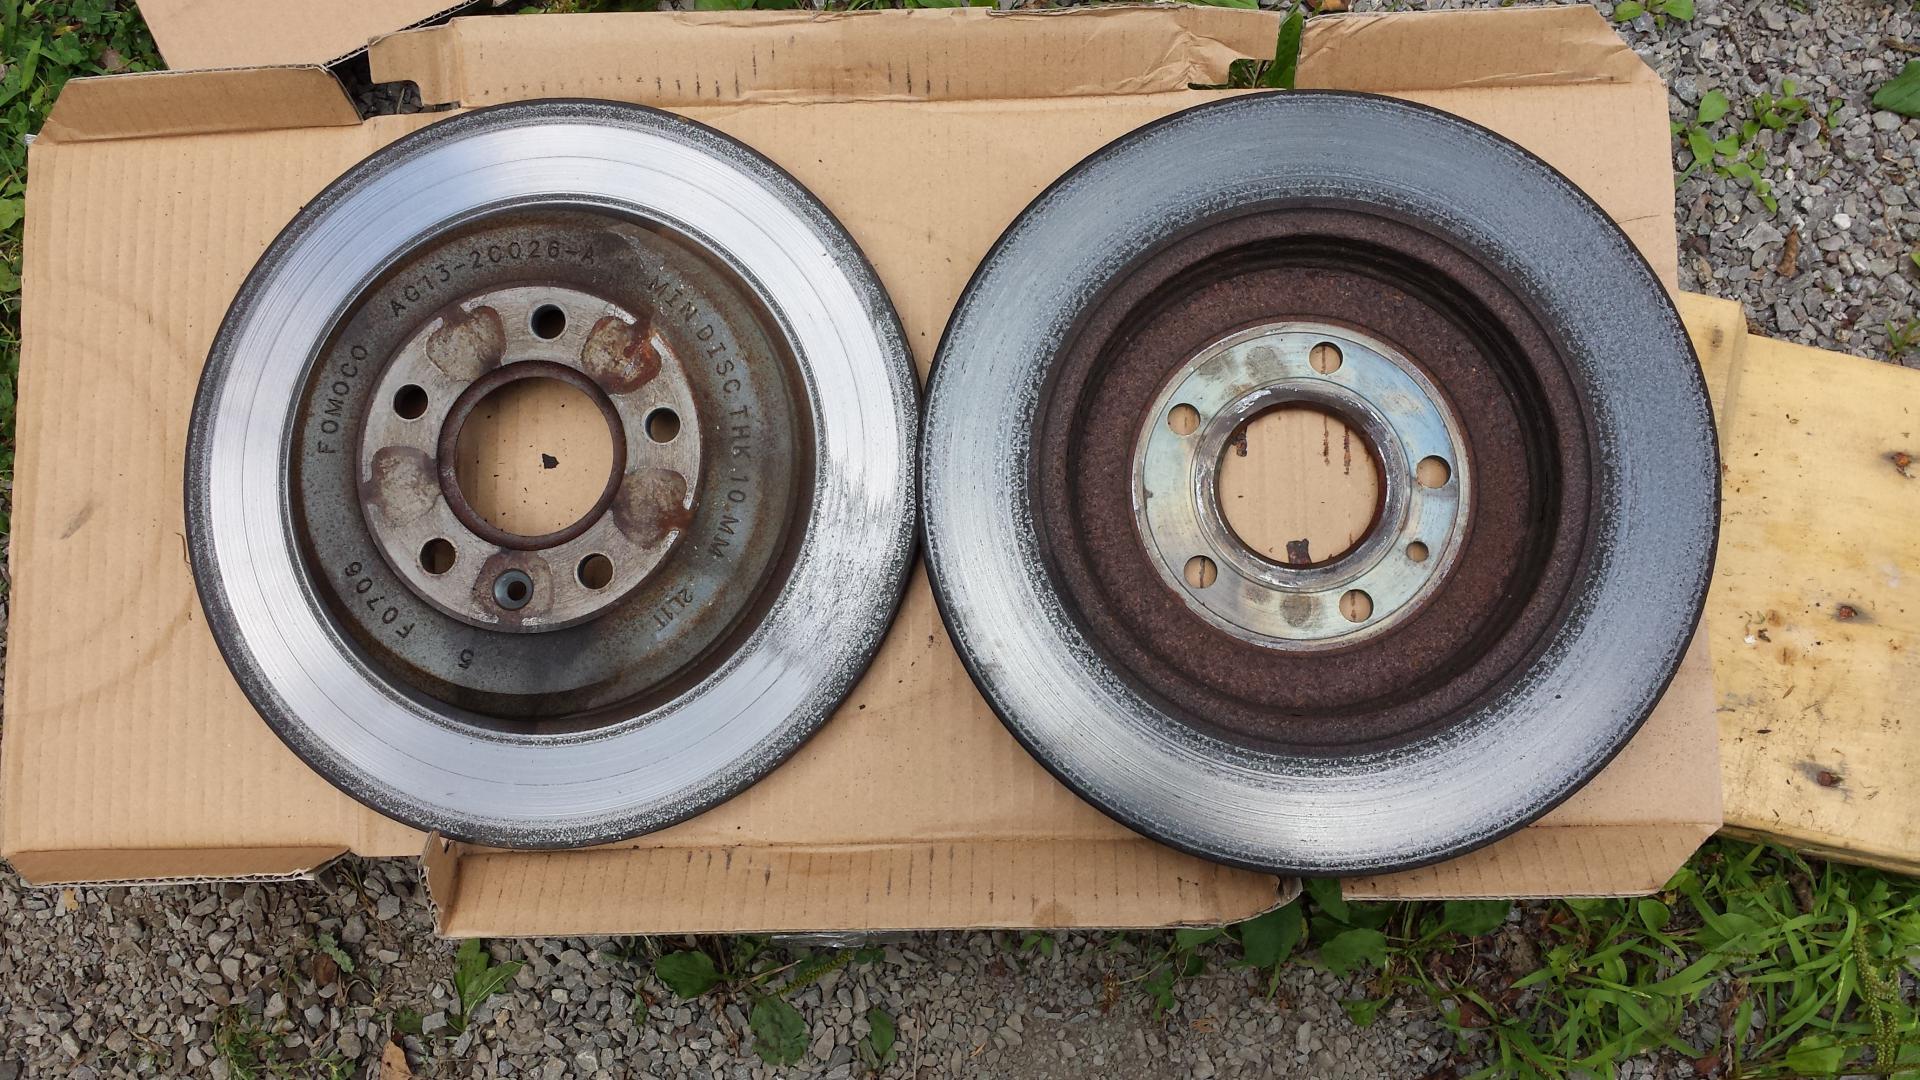 Click image for larger version Name: 2013 taurus rear rotors 25k miles.jpg  Views